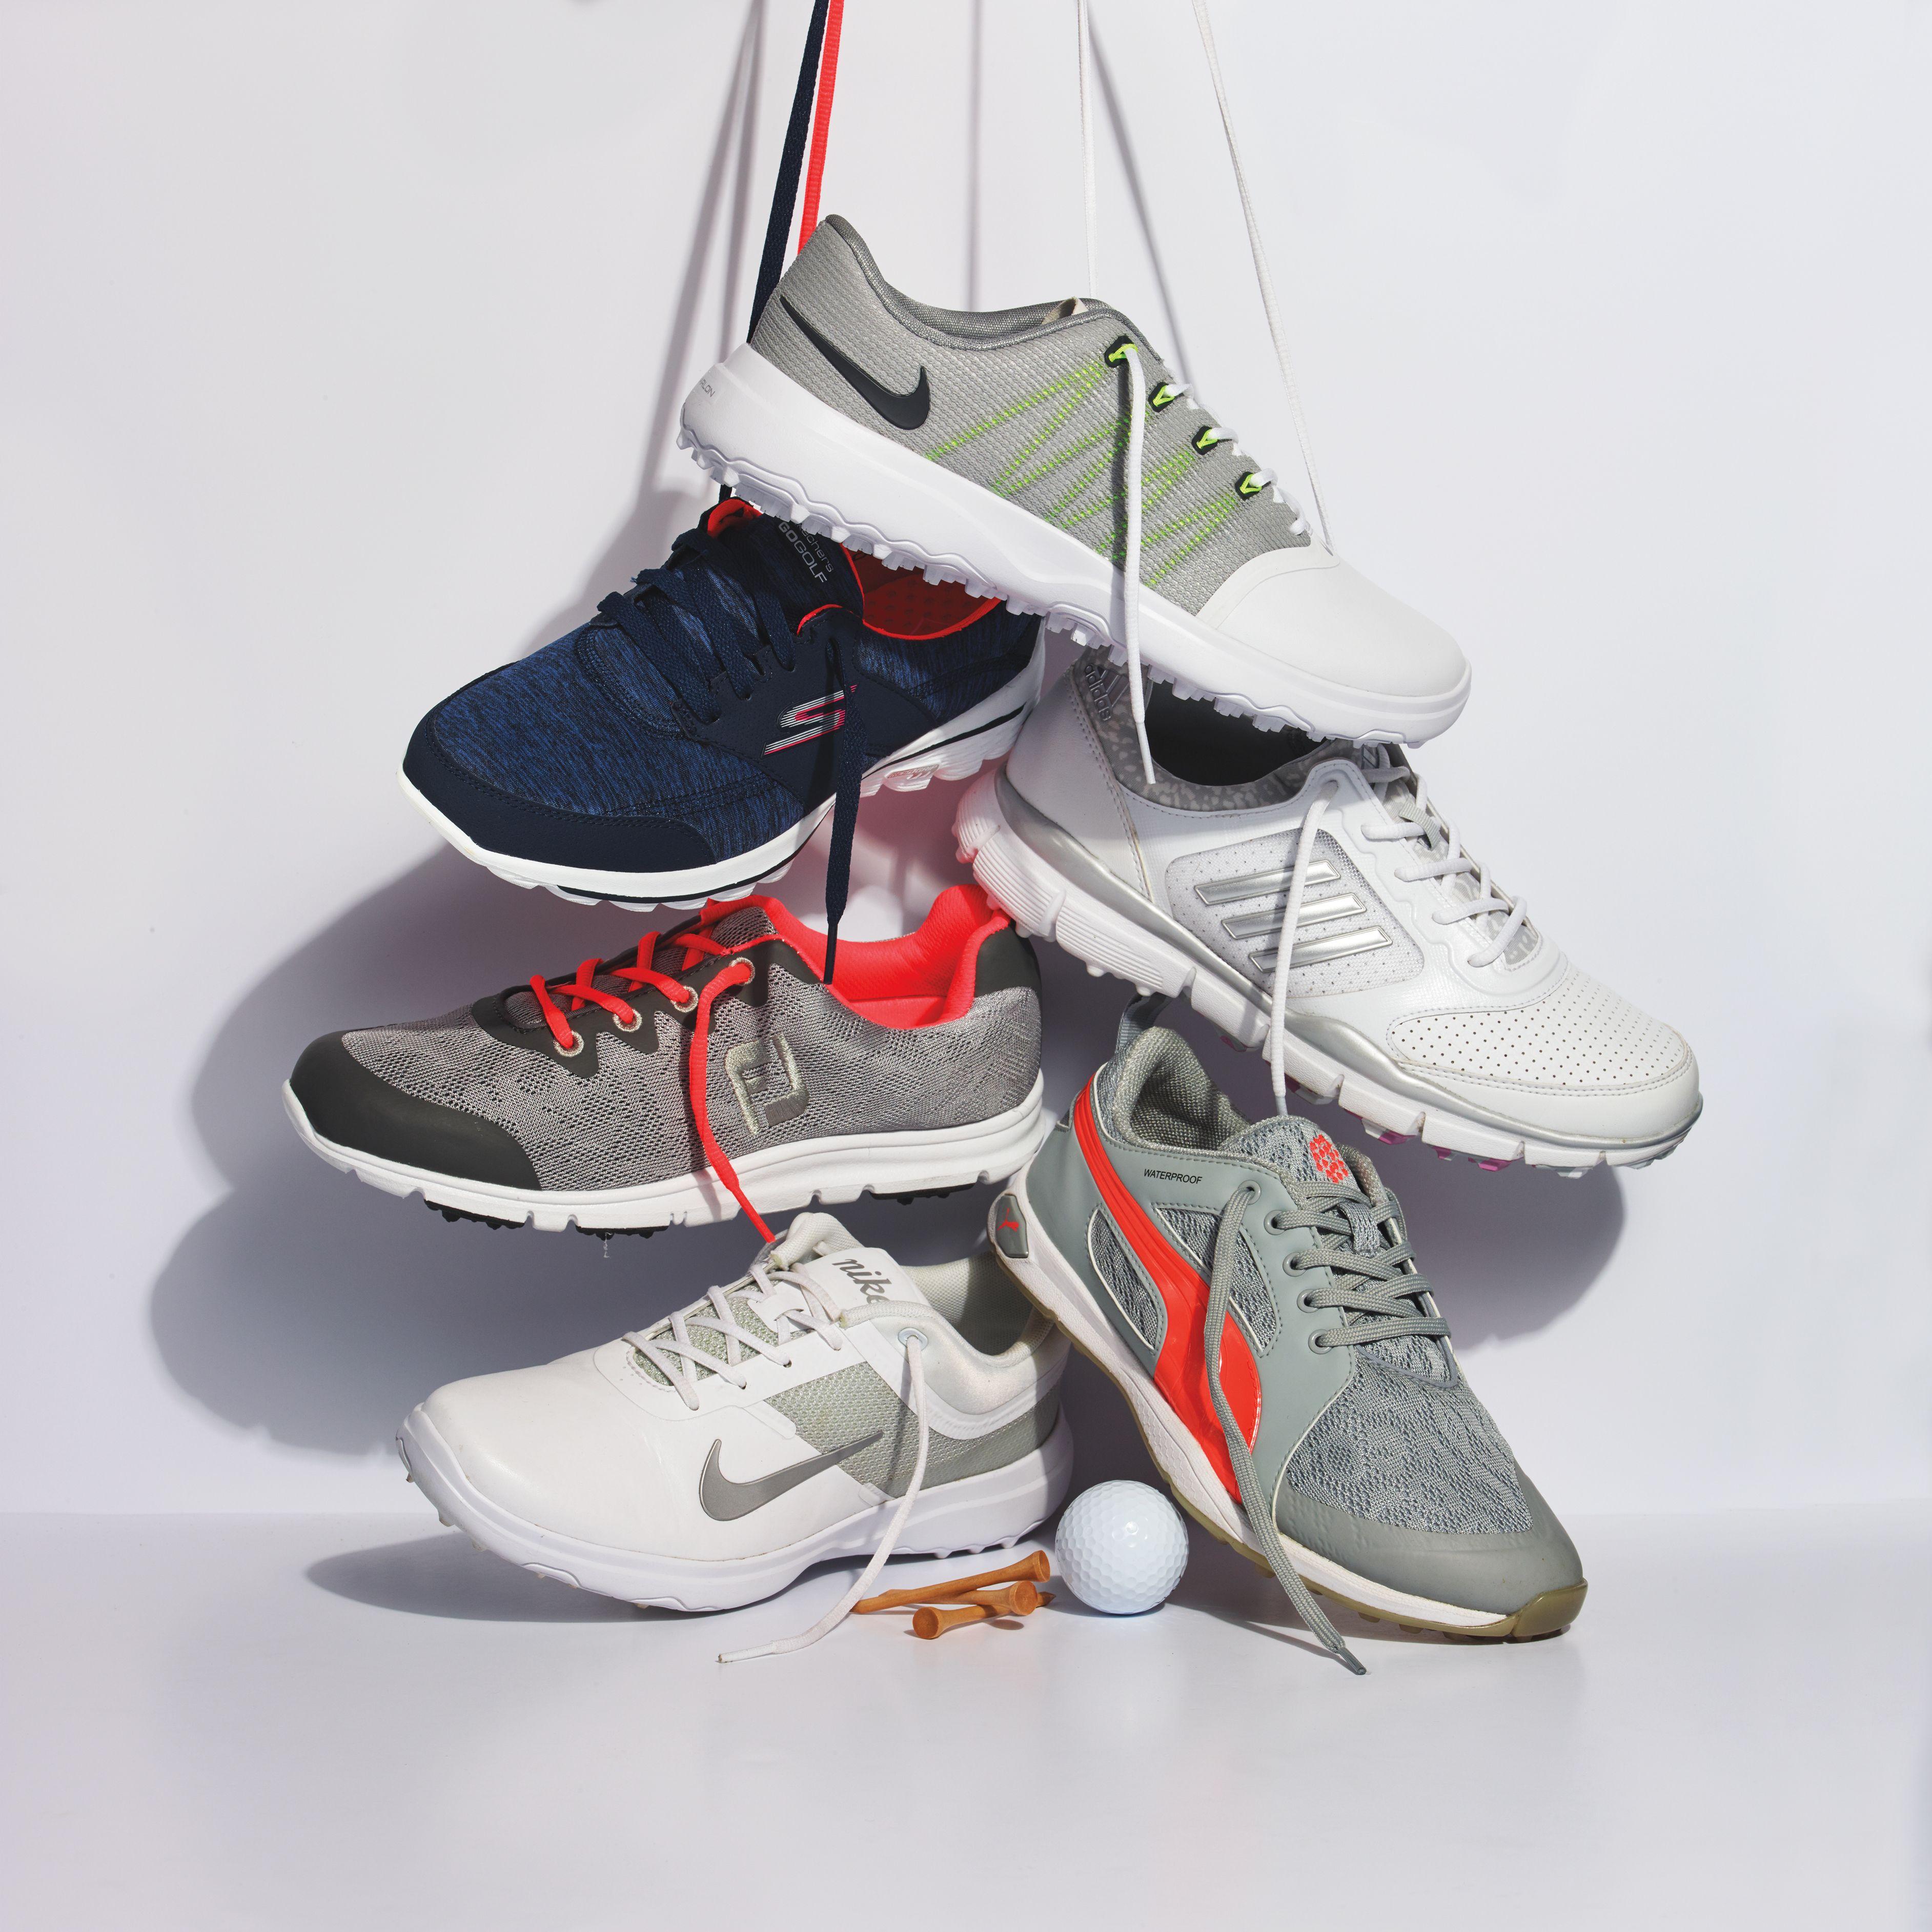 Lunar Empress 2 Golf Shoes | Nike women